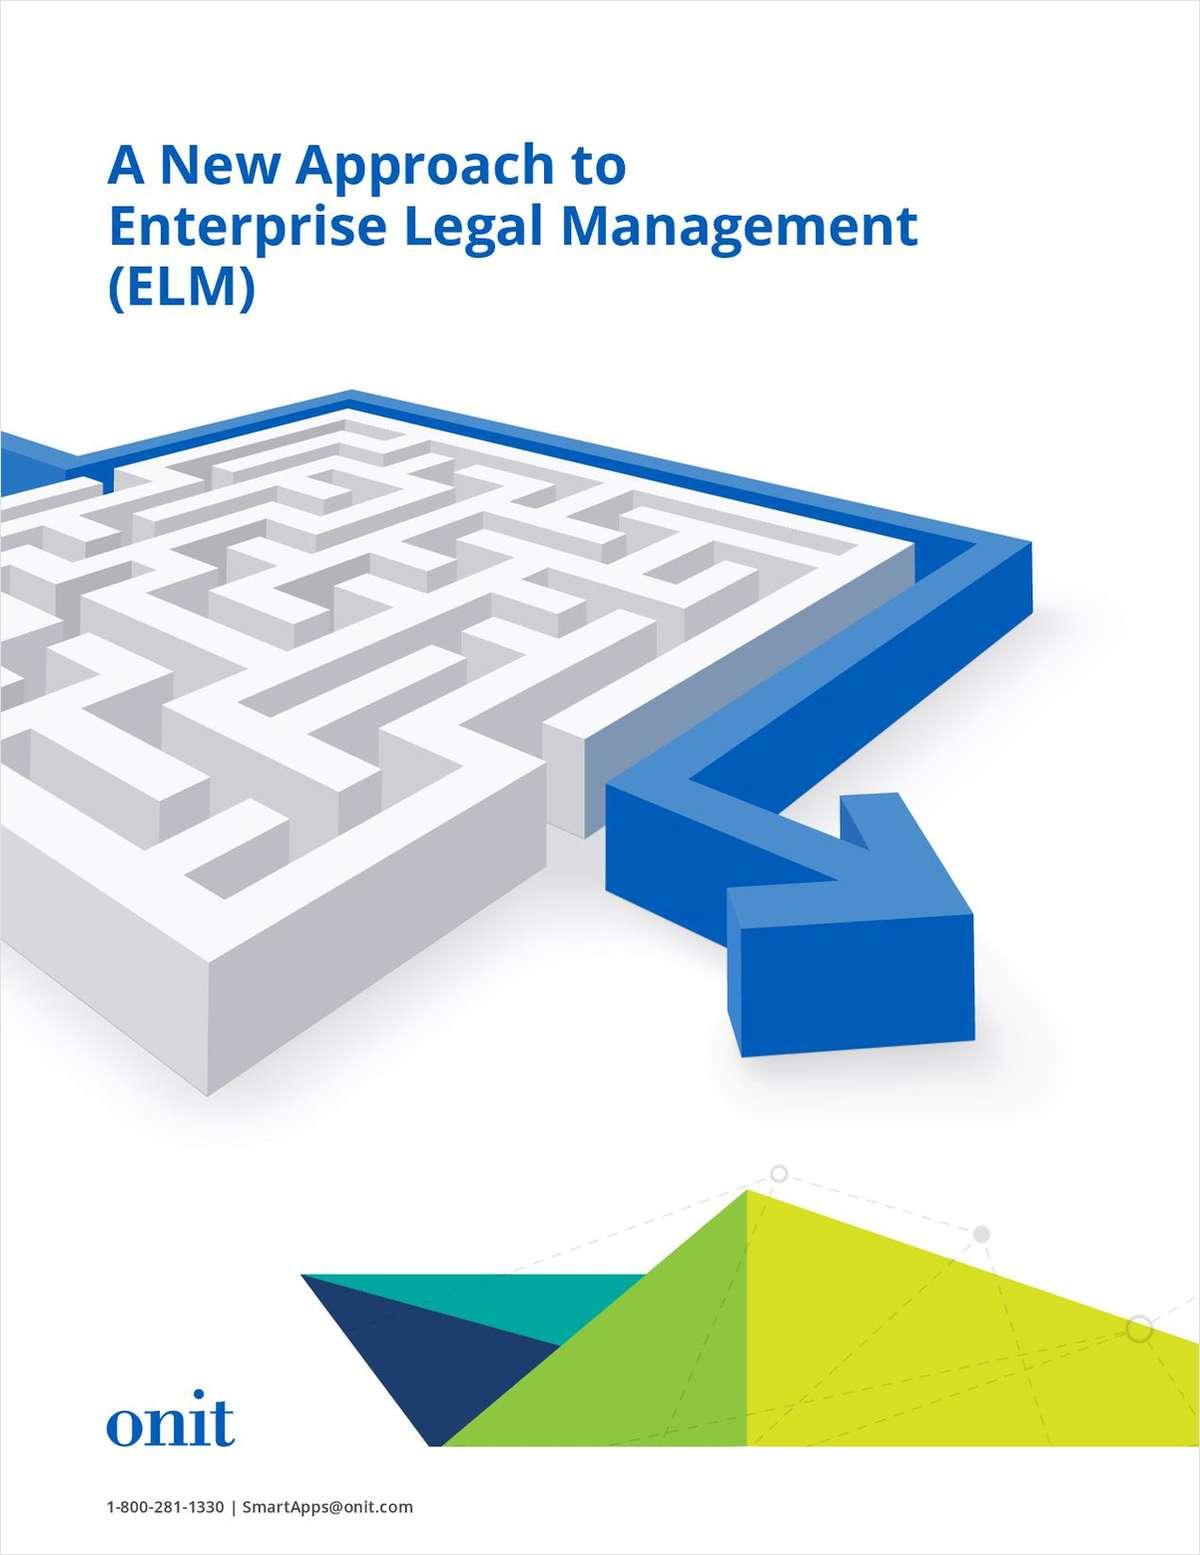 A New Approach to Enterprise Legal Management